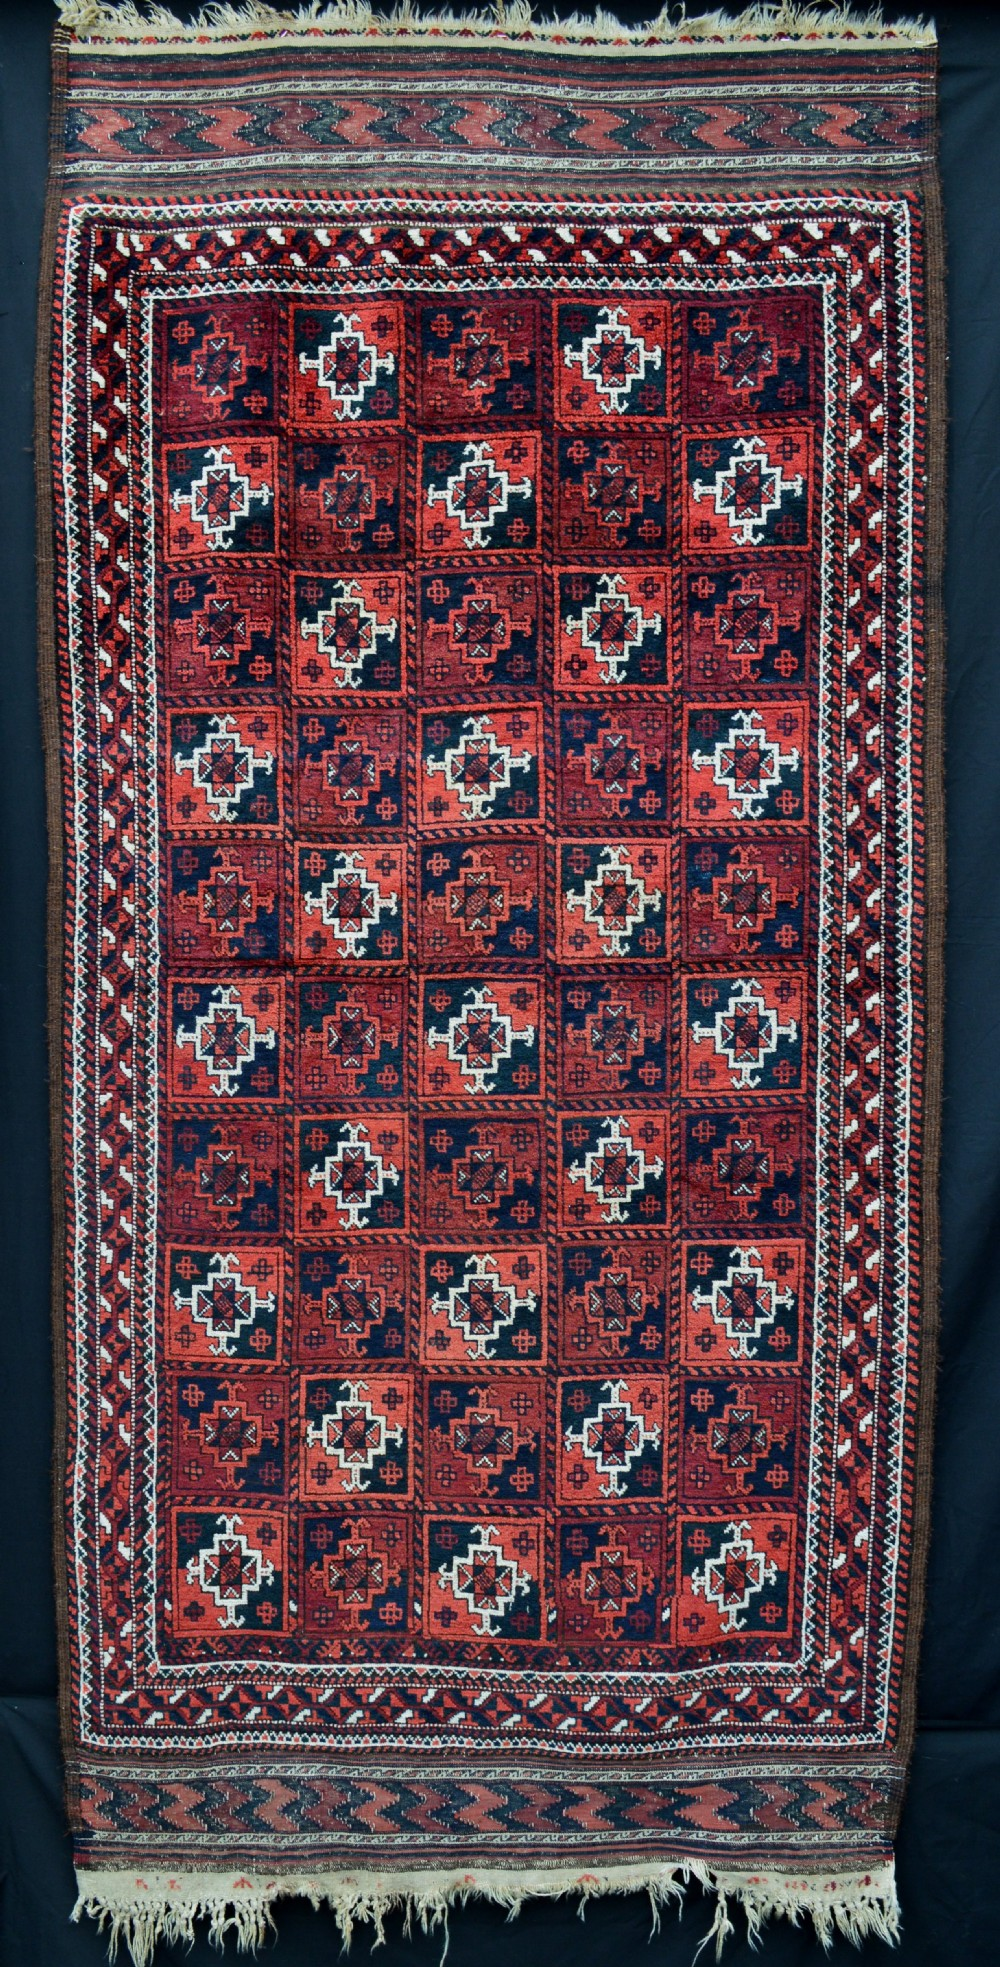 antique baluch rug mahdad khani tribe khorassan northeast persia